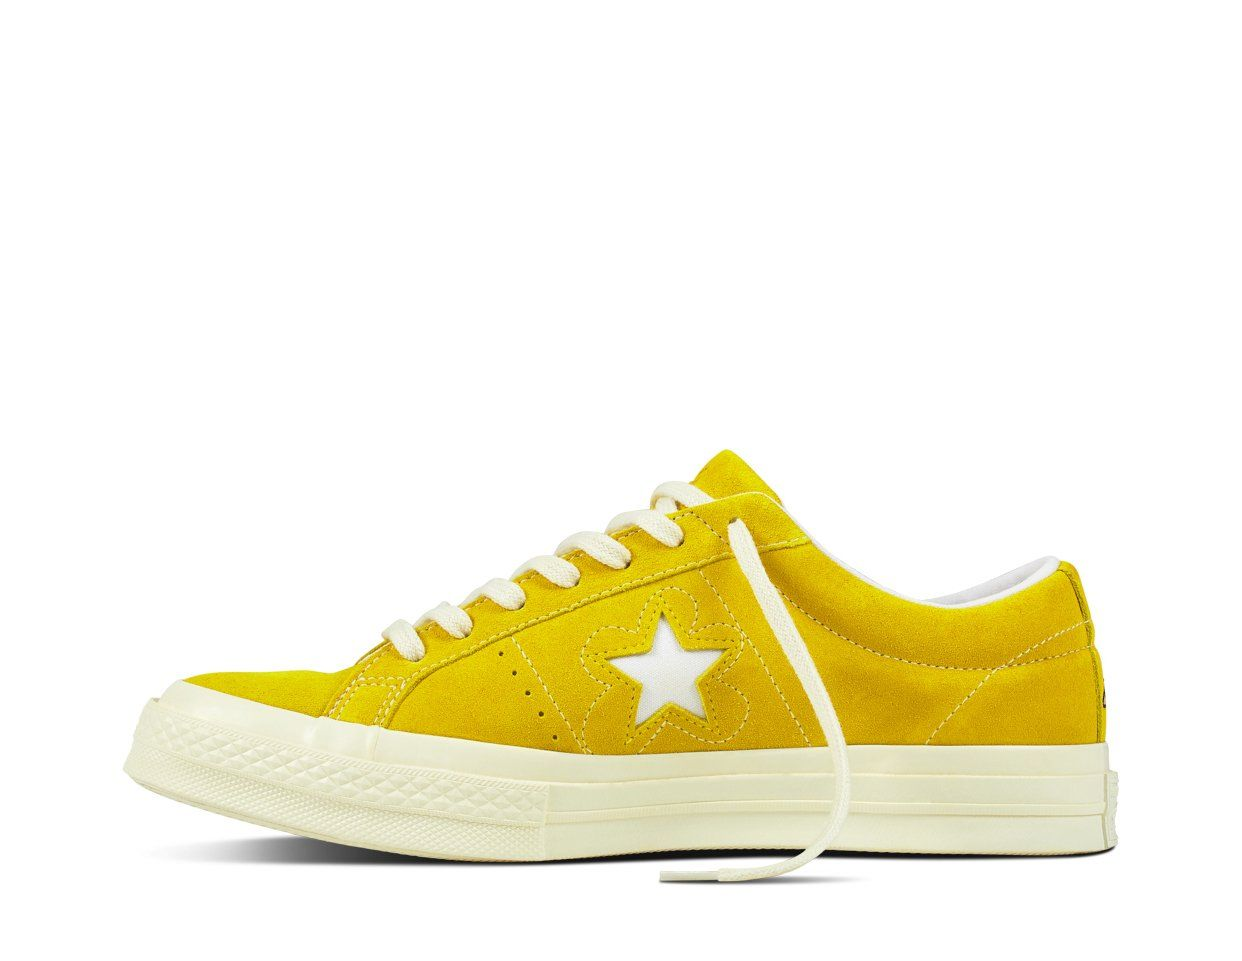 Converse One Star Ox Golf Le Fleur Size